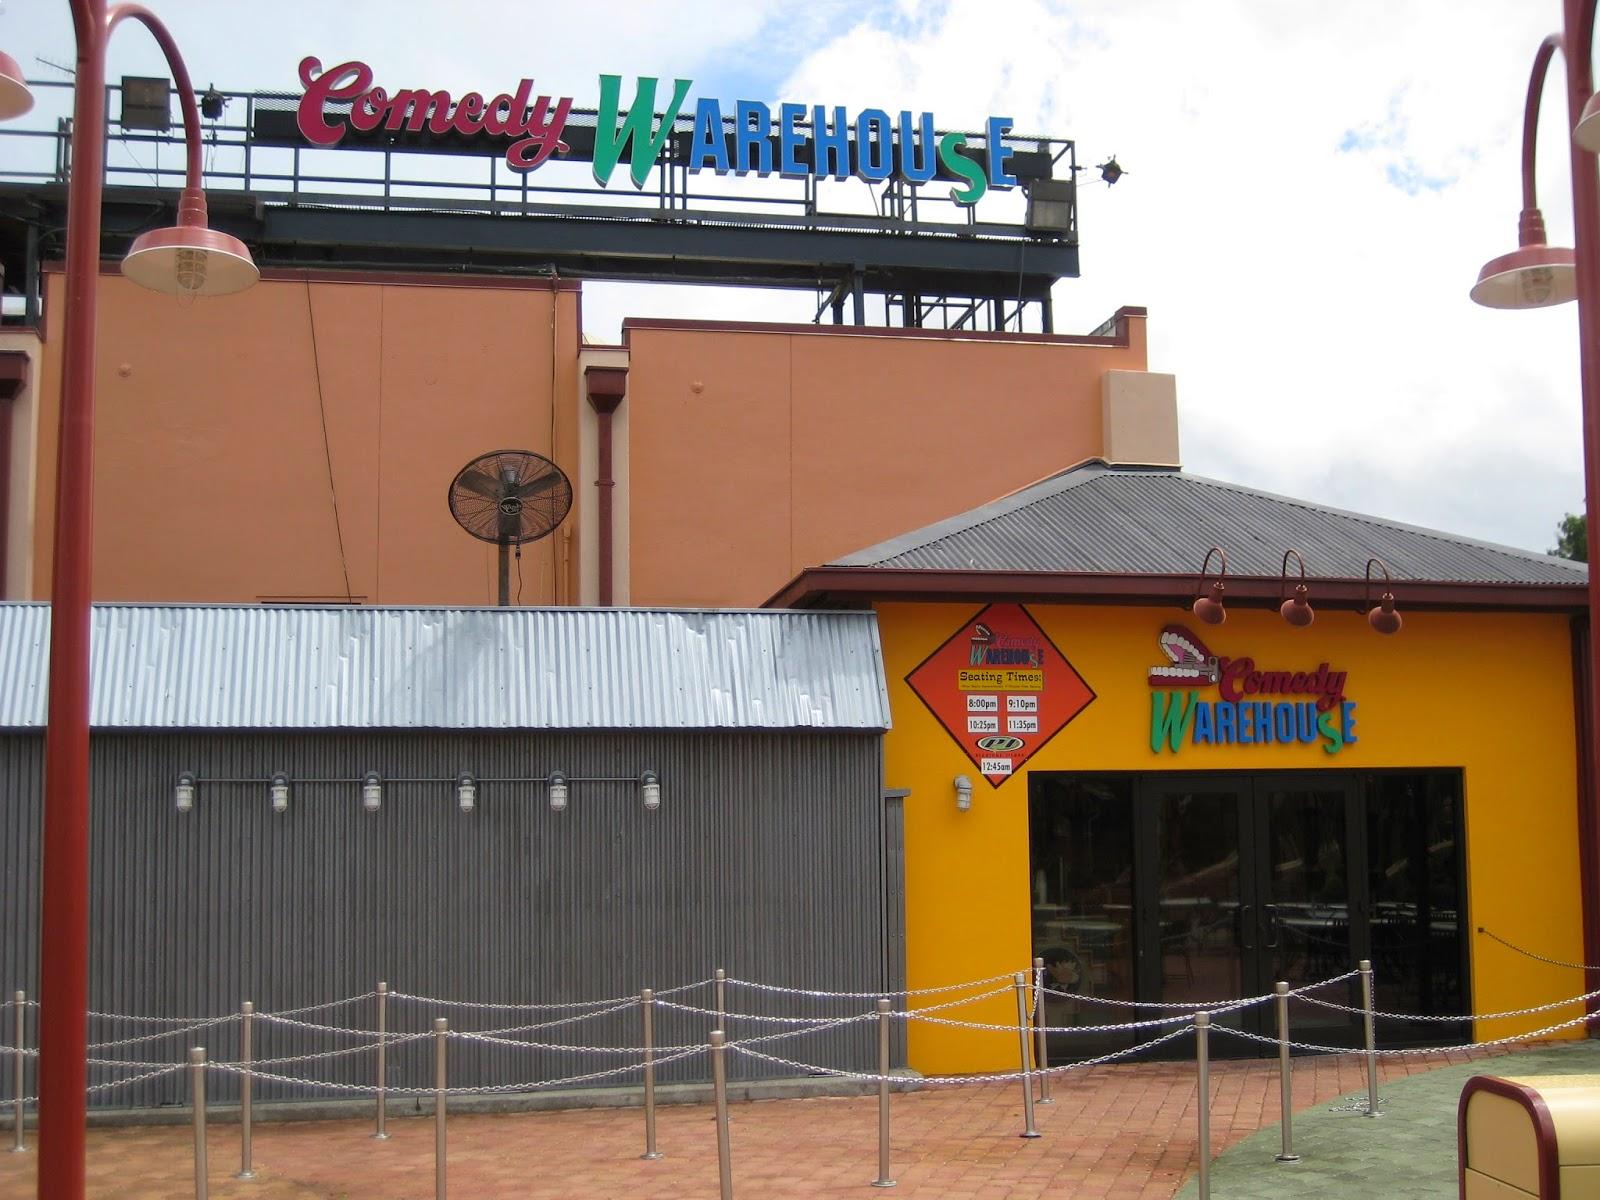 Disney Comedy Club - Comedy Clubs - Pleasure Island